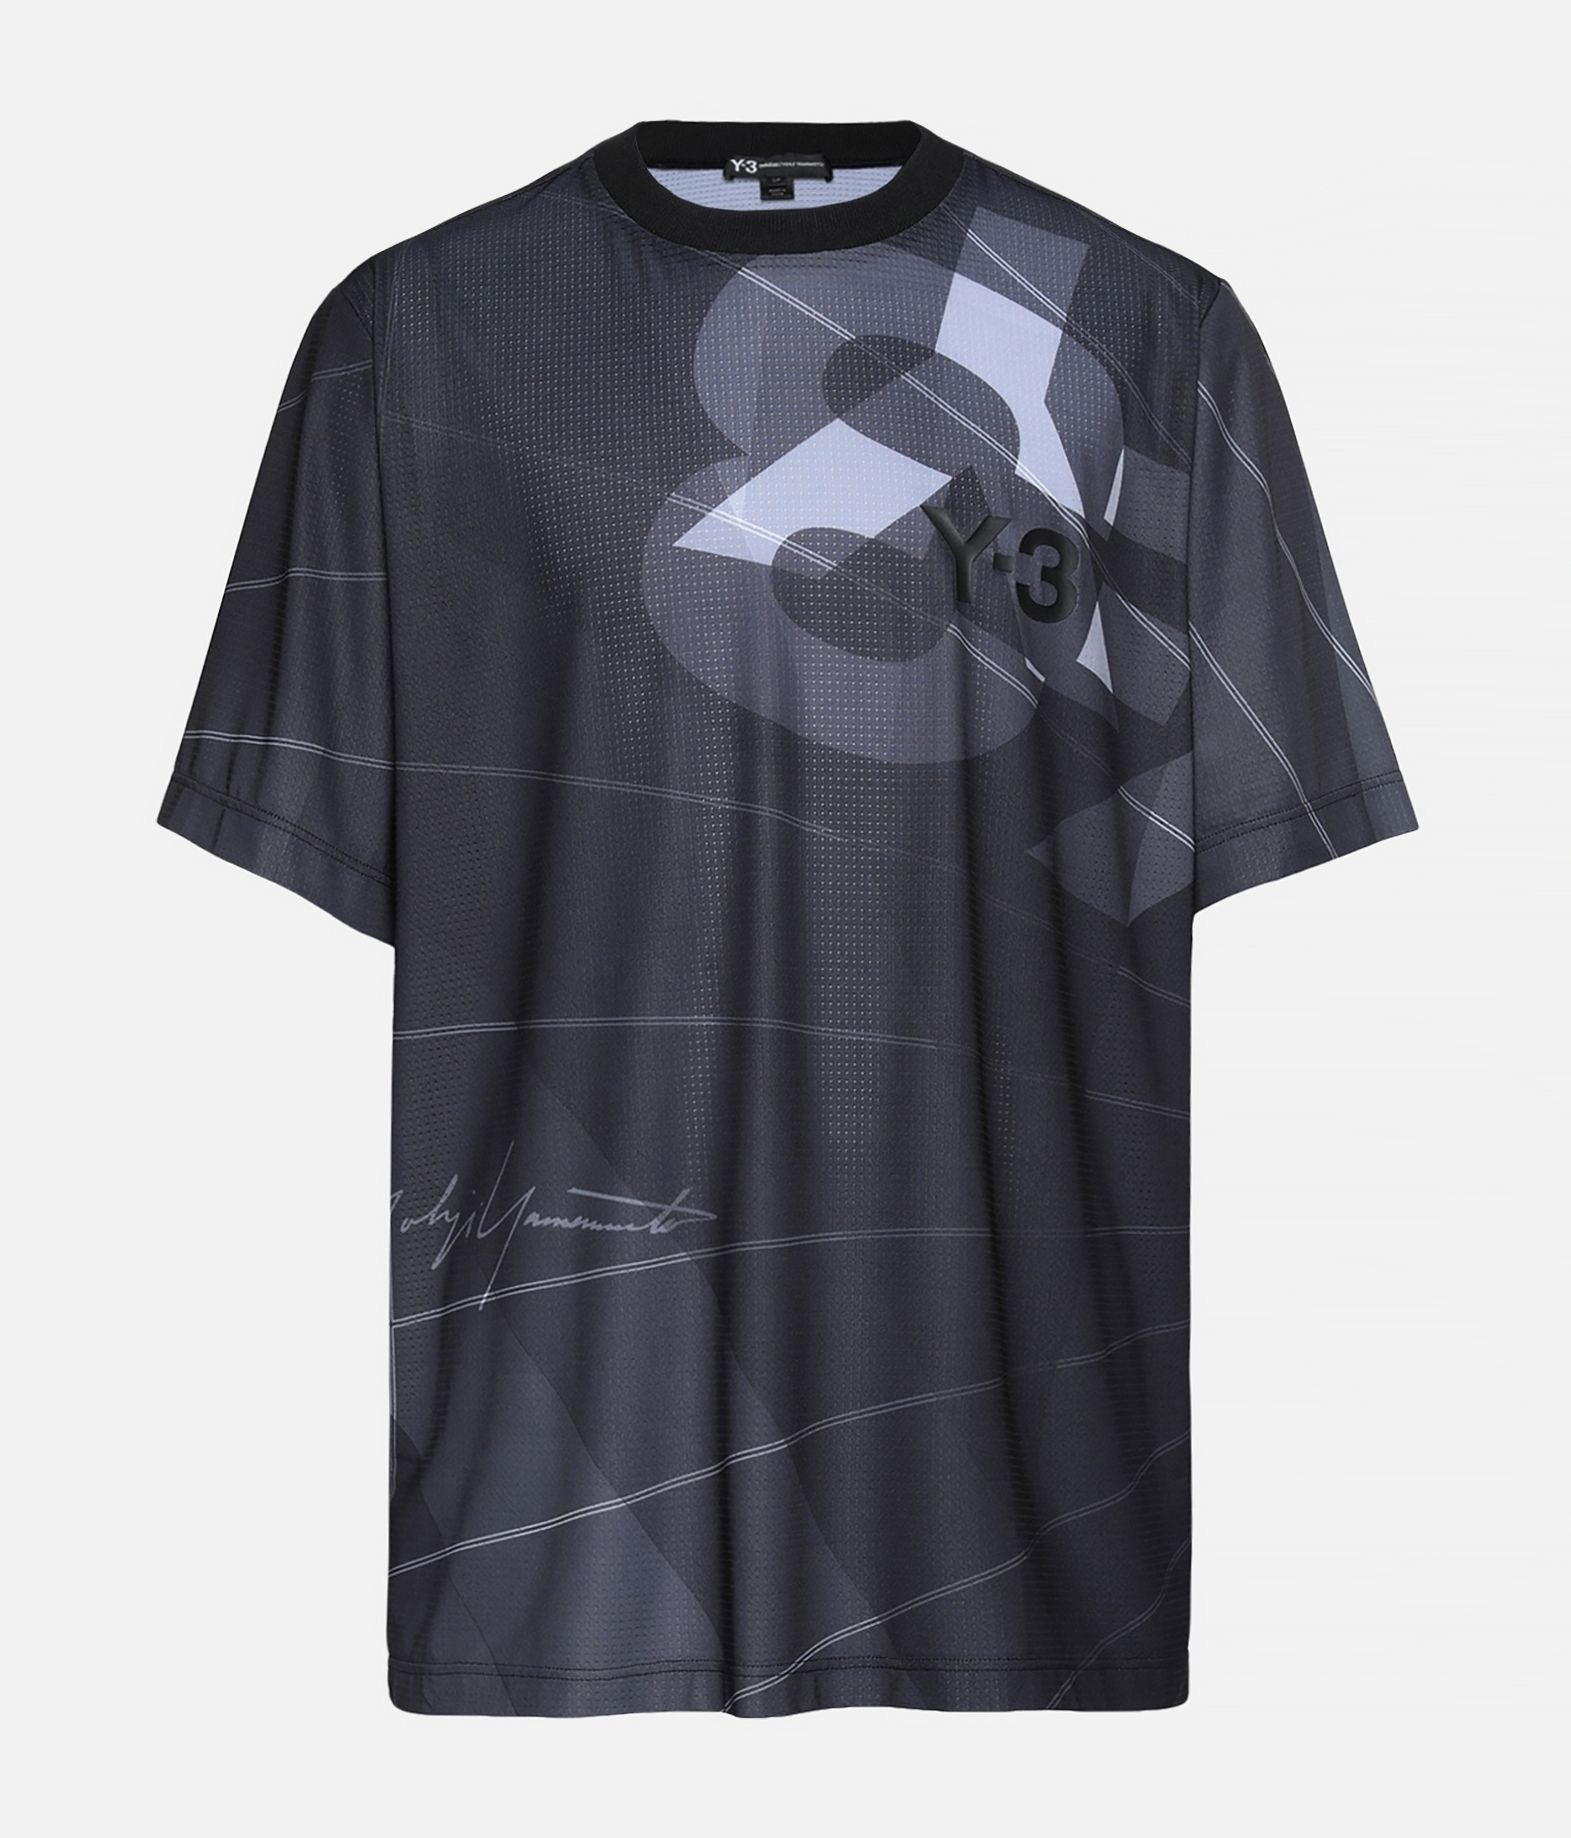 Y-3 Y-3 AOP Football Shirt Kurzärmliges T-shirt Herren f